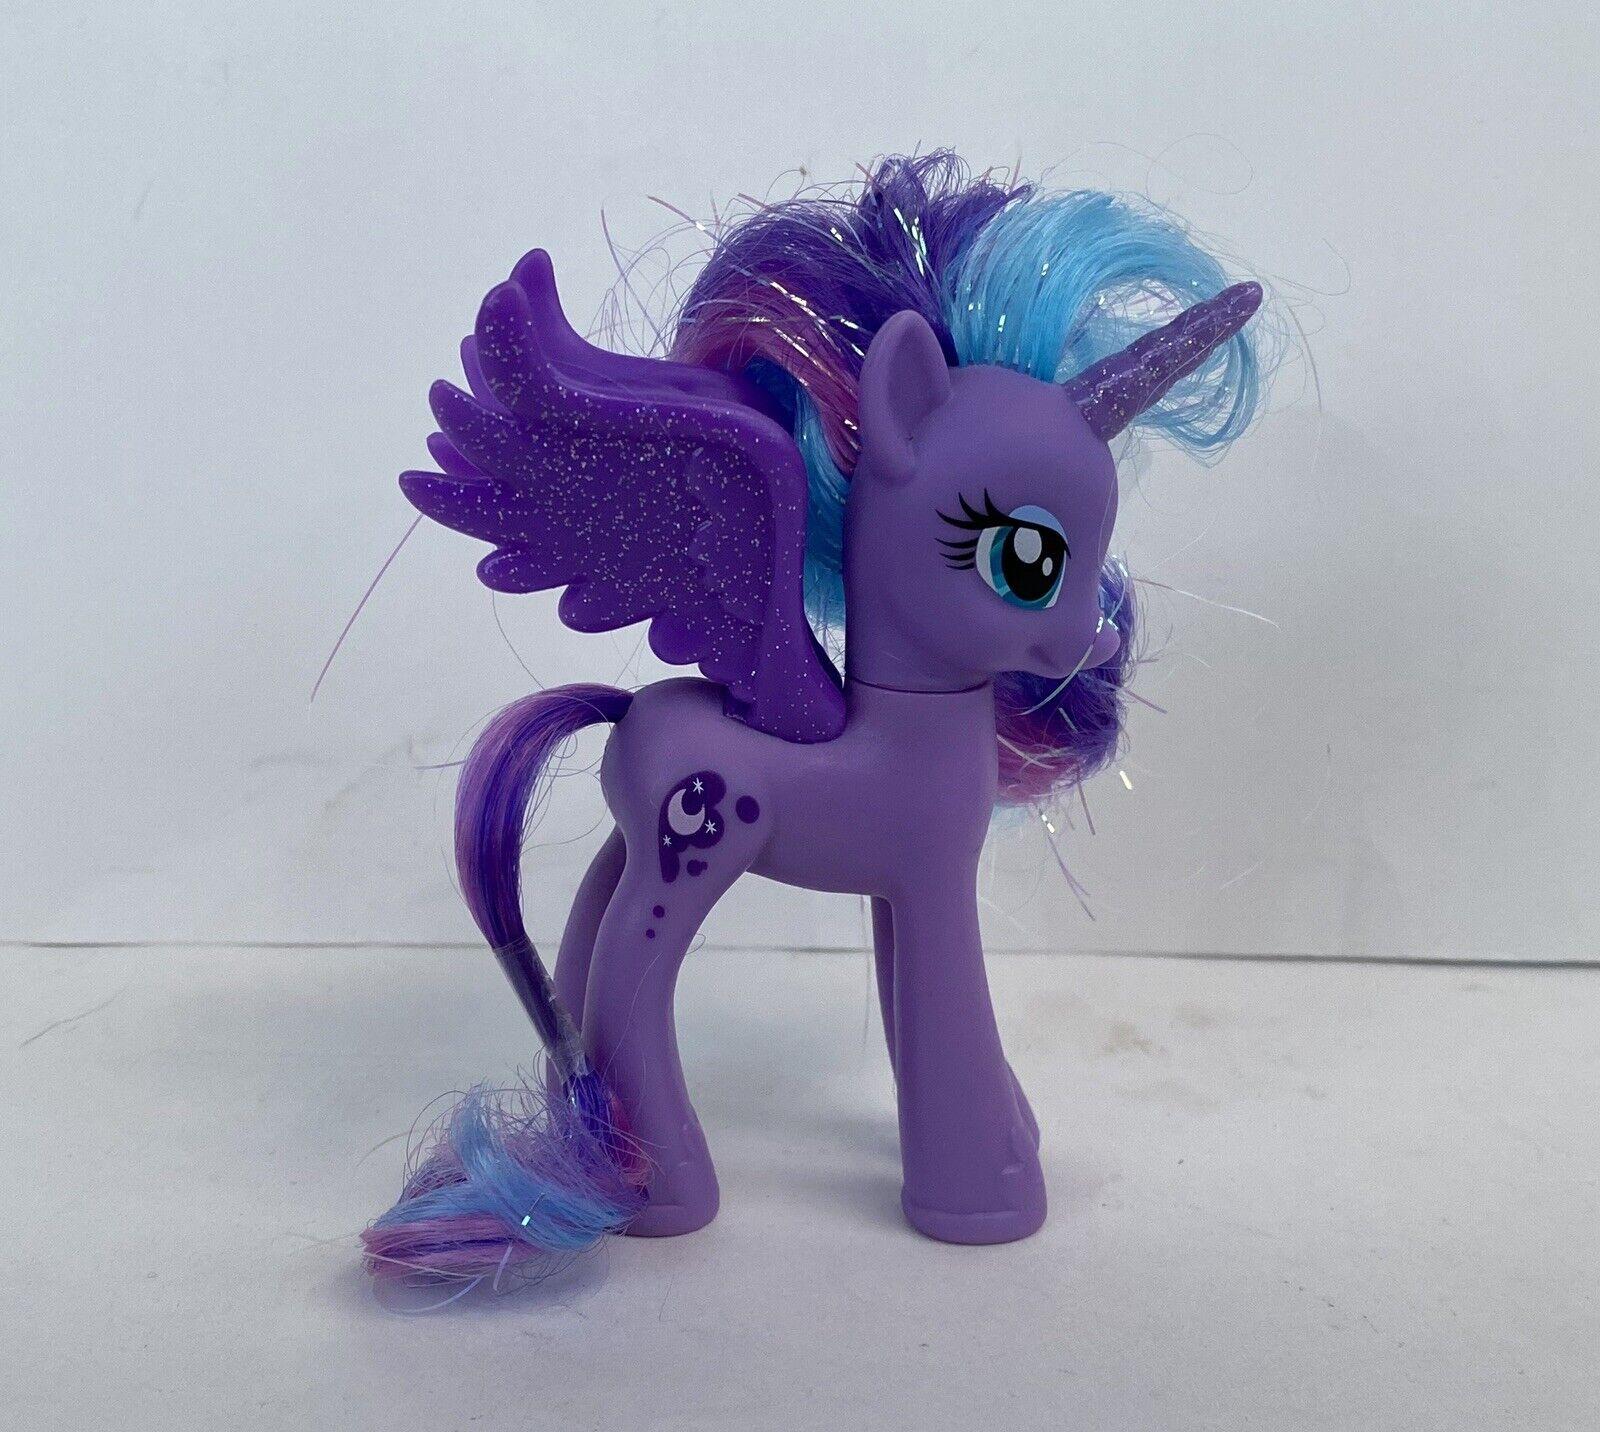 My Little Pony Mlp G4 Friendship Is Magic Princess Sterling Fluttershy 2 Pack For Sale Online Ebay